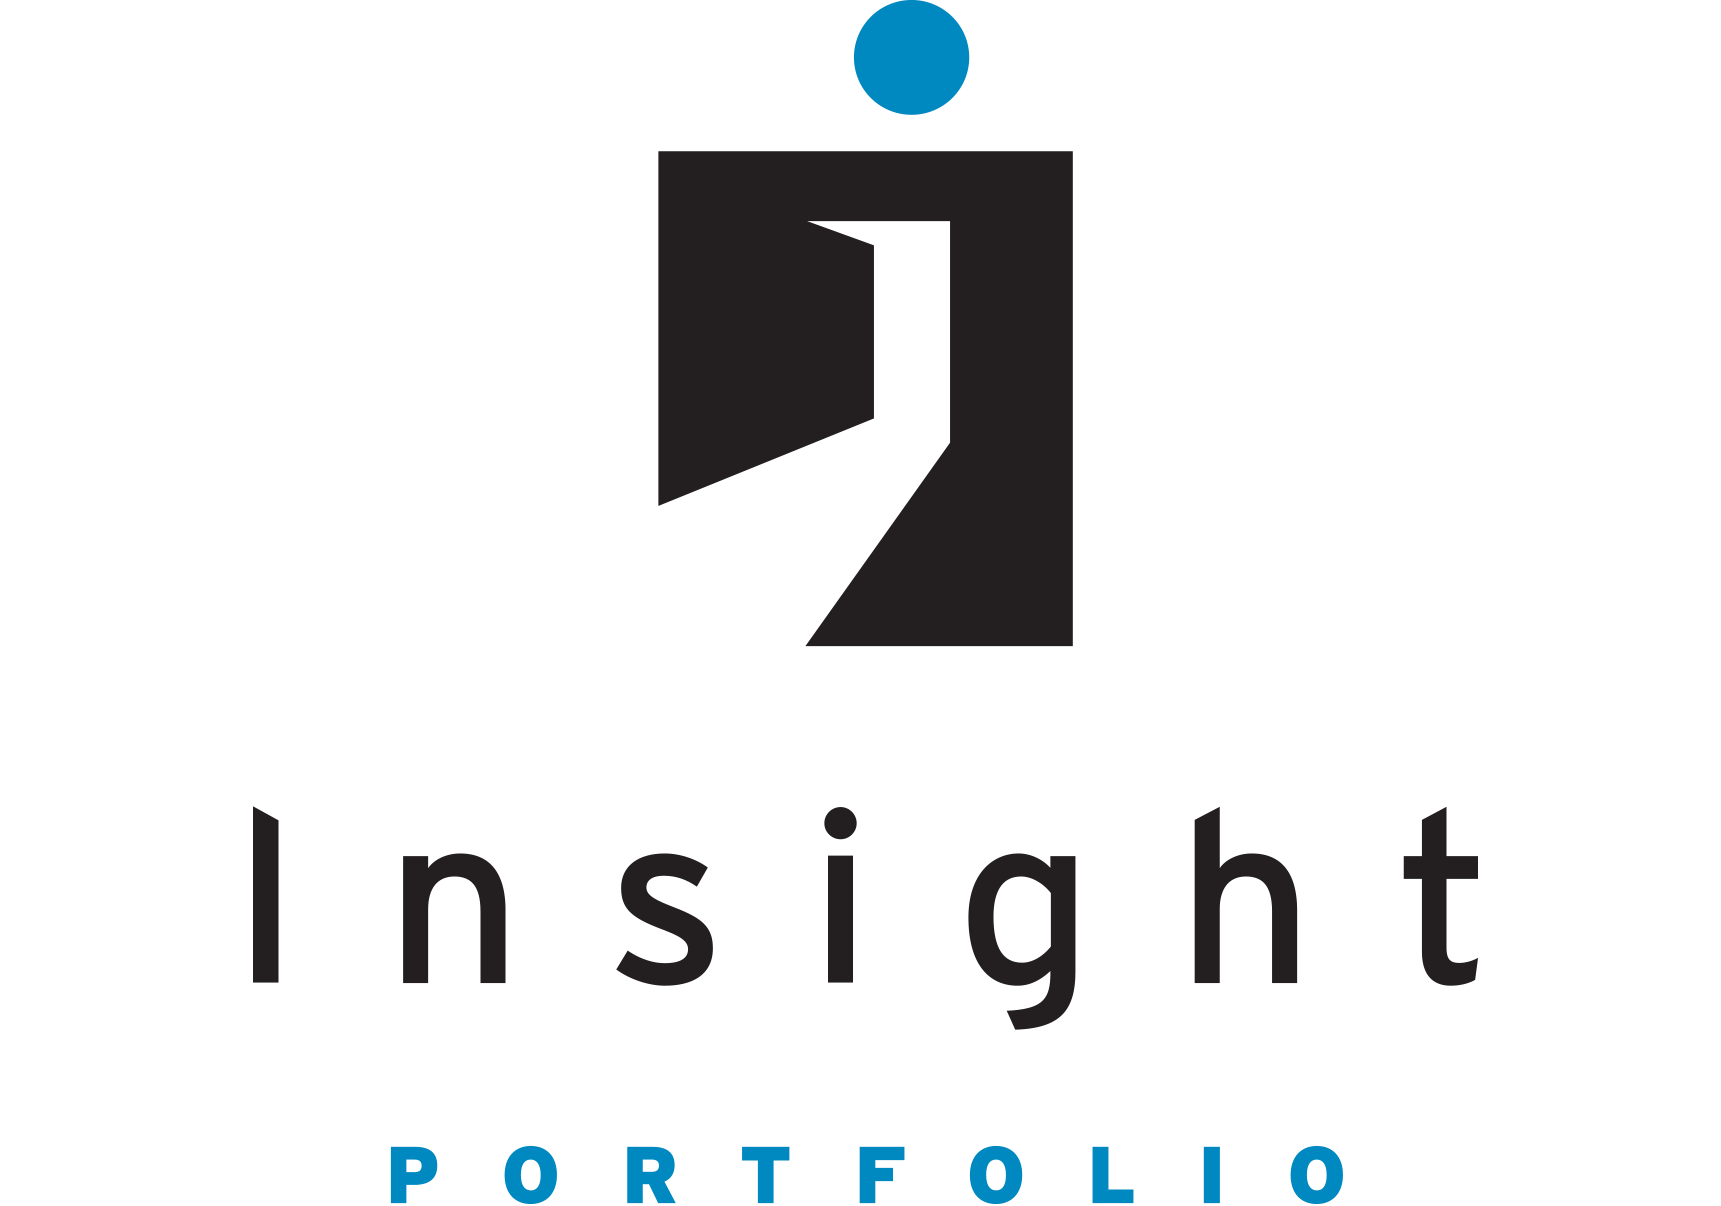 Insight Portfolio